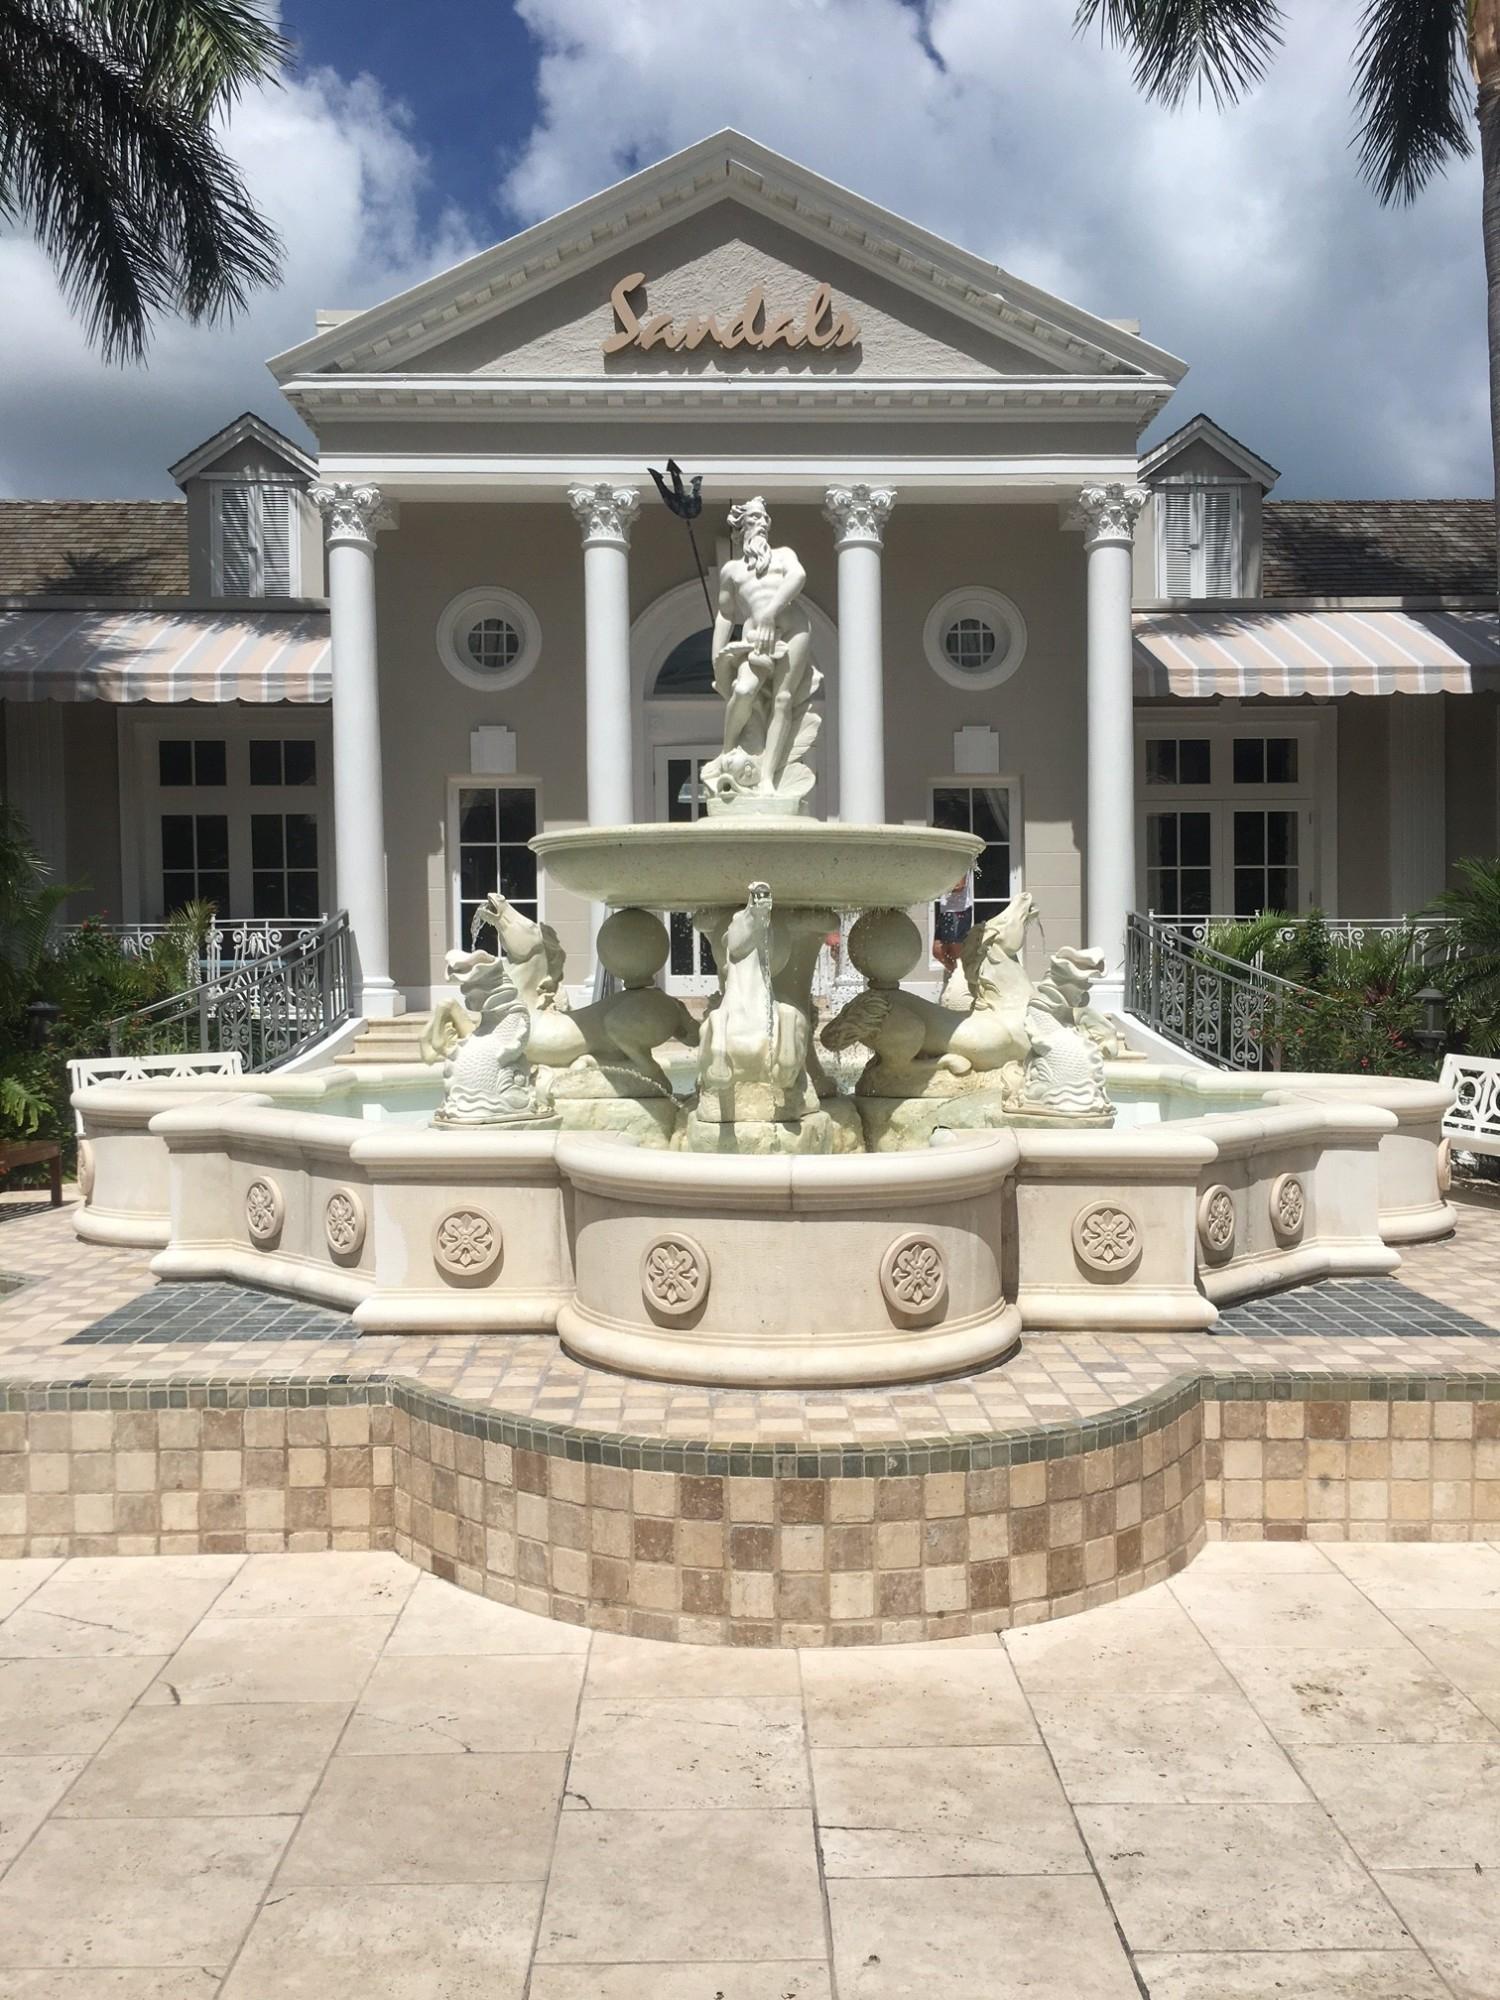 Sandals Royal Bahamian in Nassau